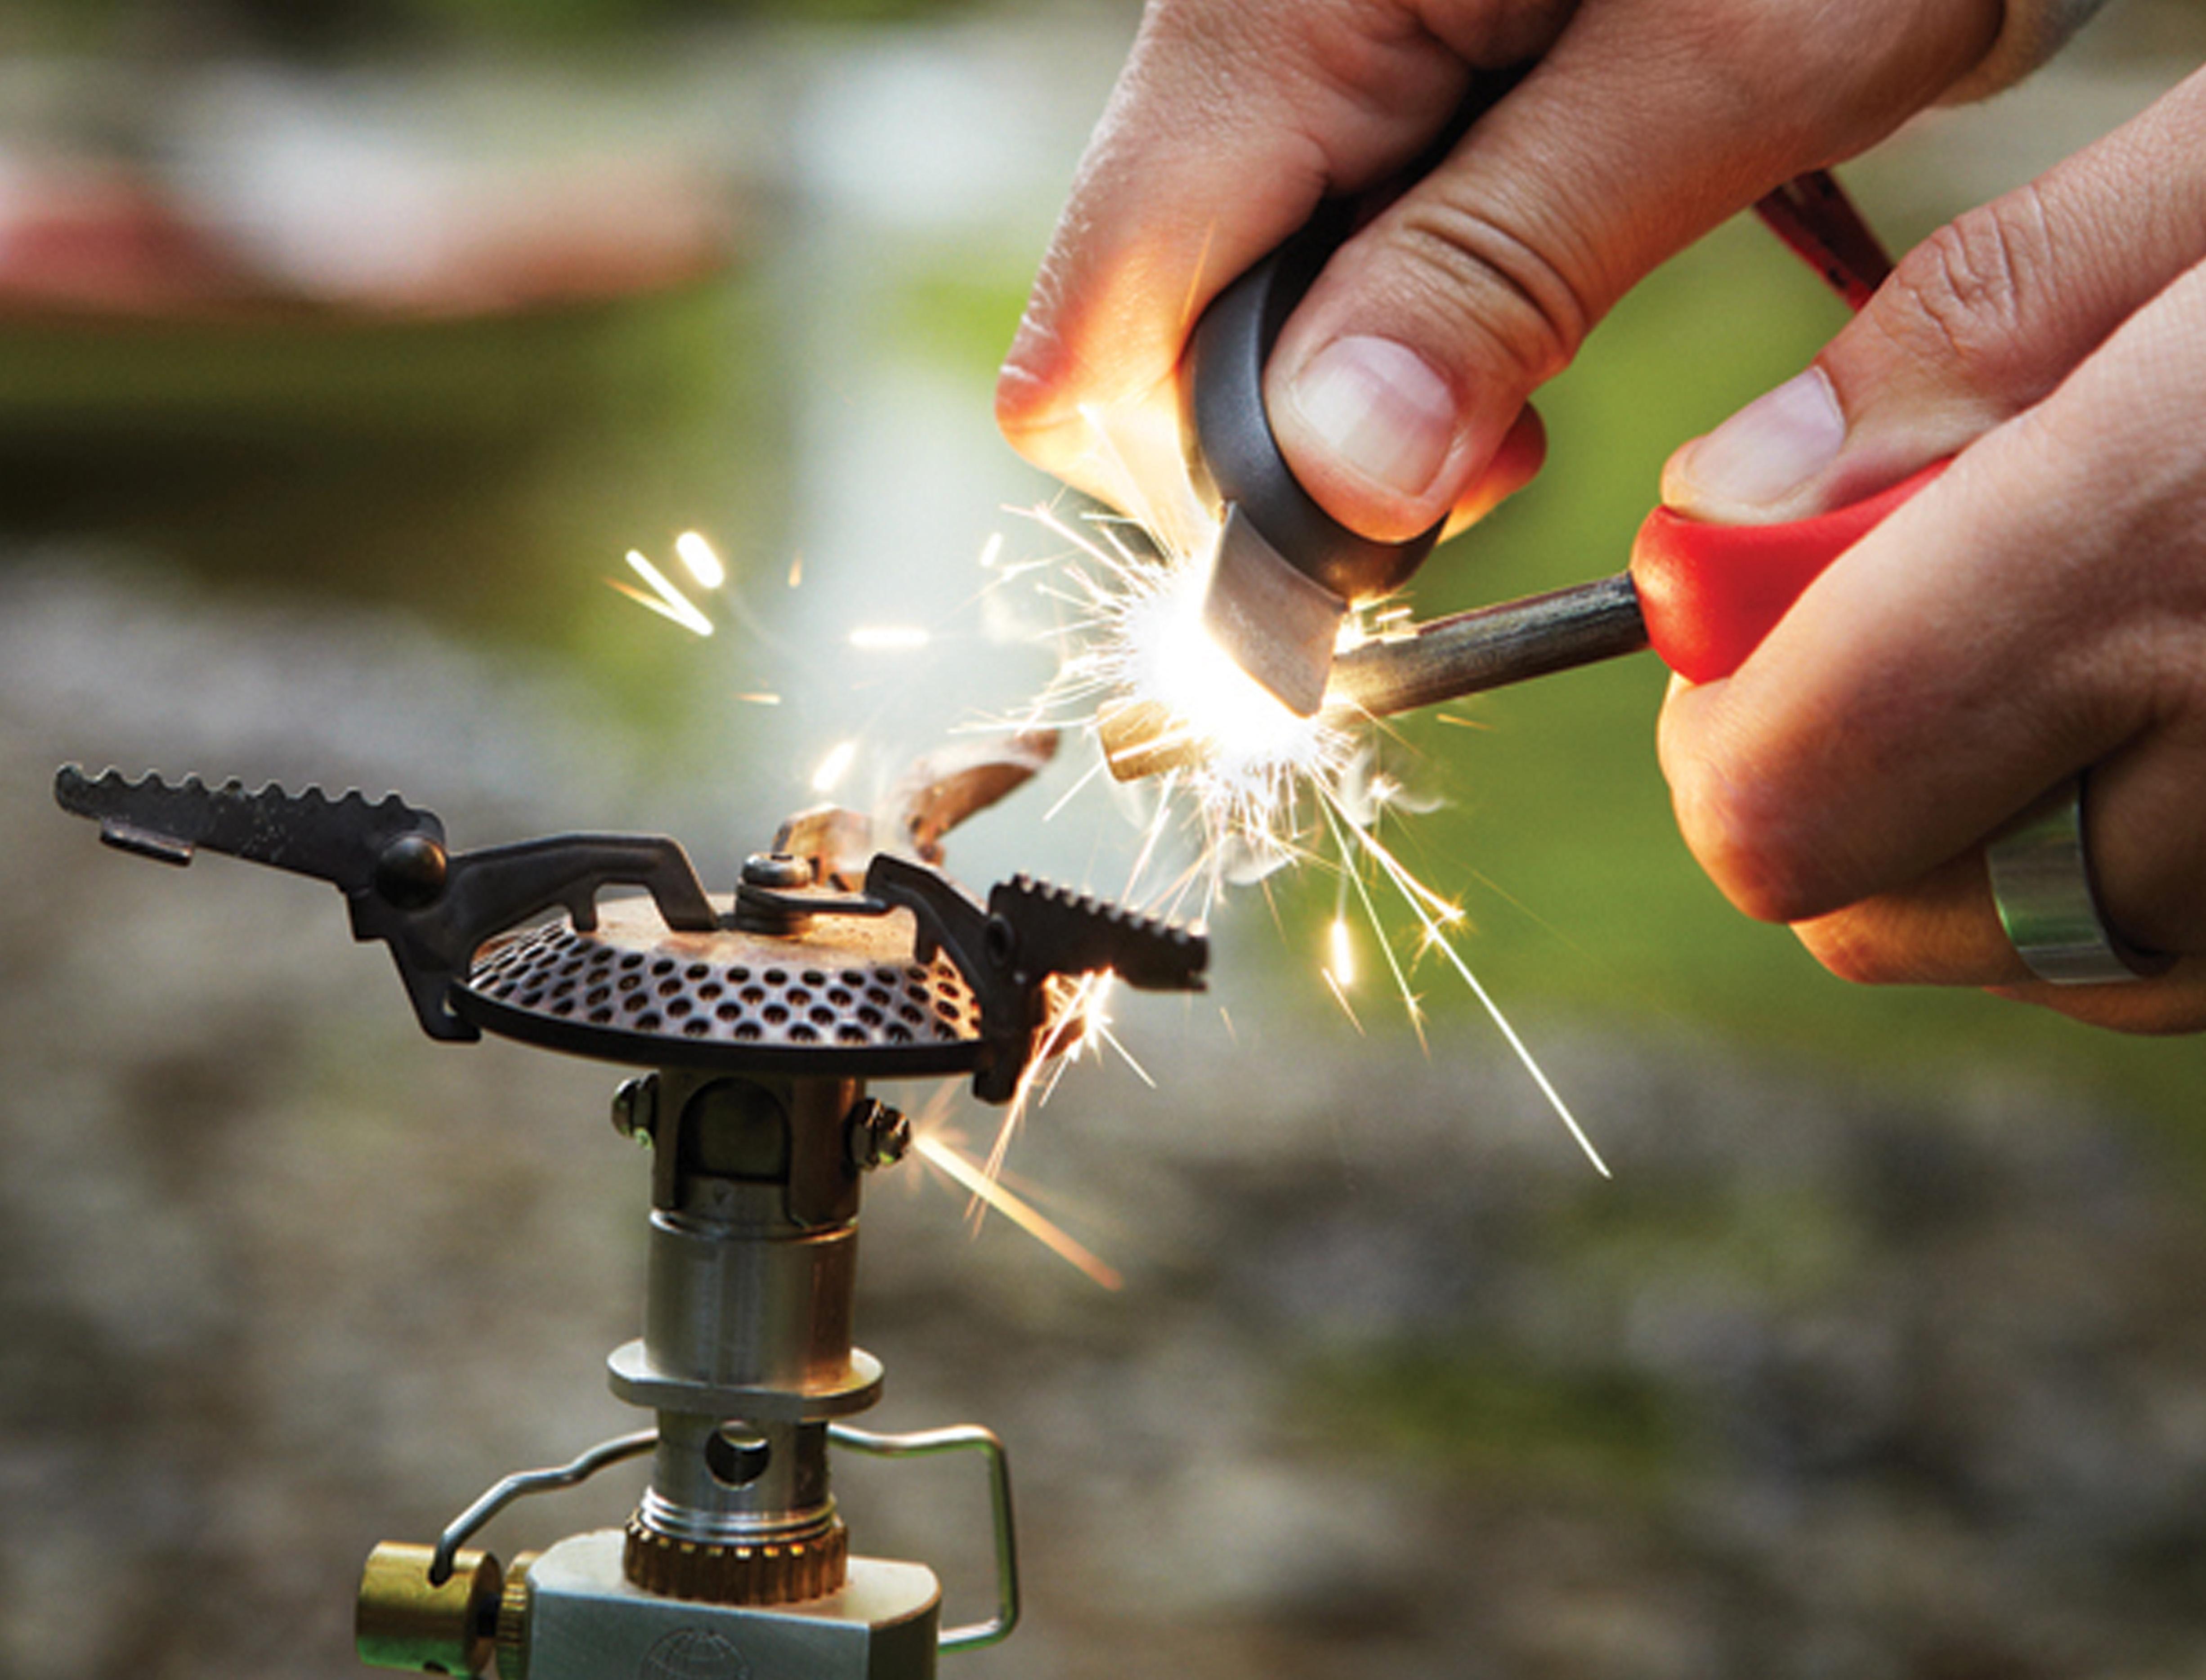 how to use firesteel fire starter